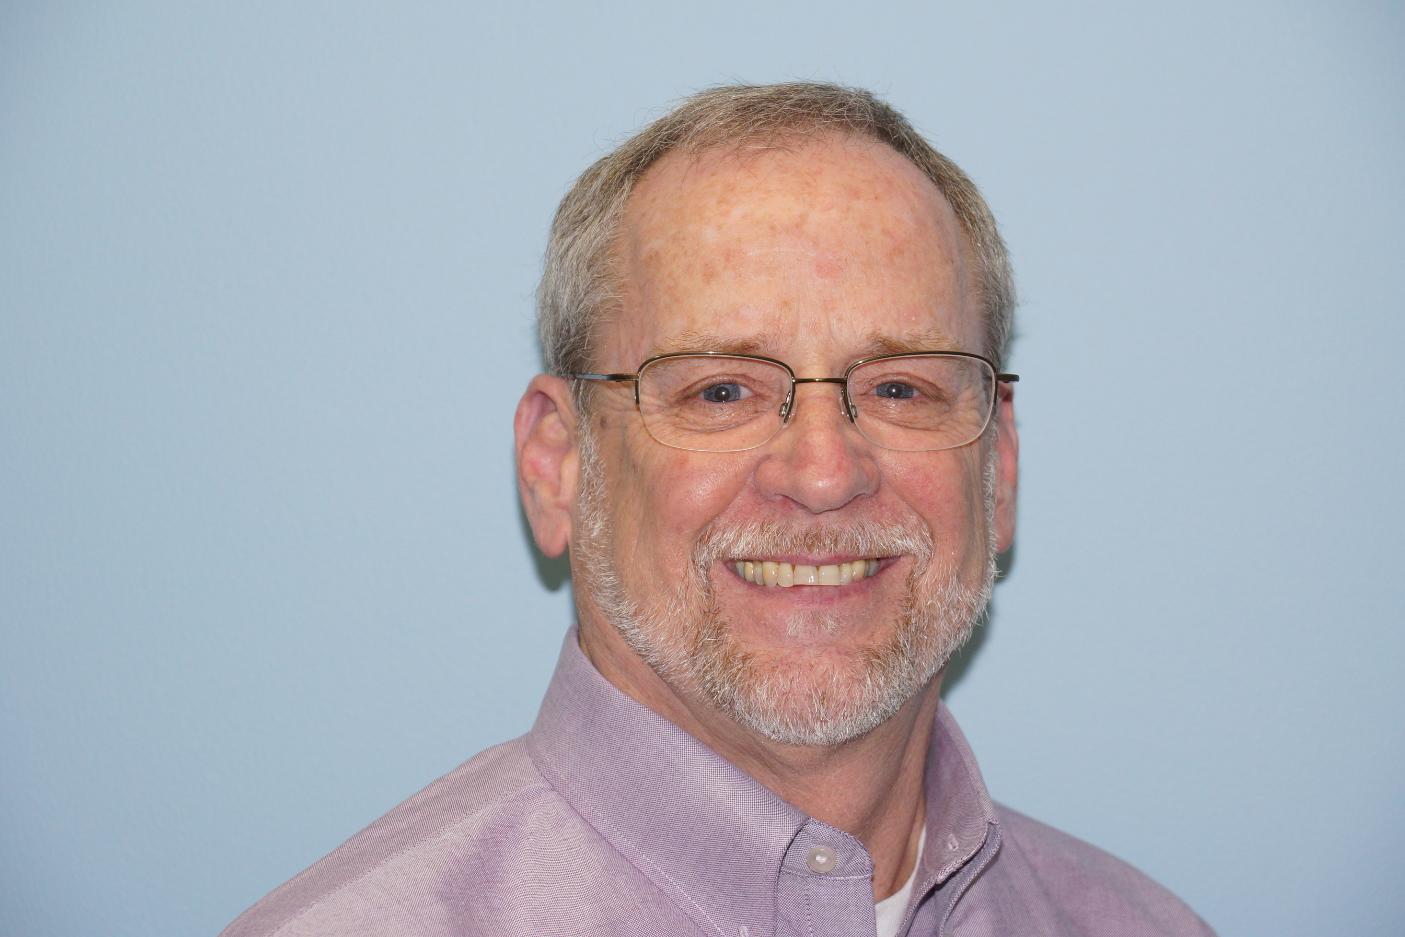 Mark J. Tompkins, CET | About the Author